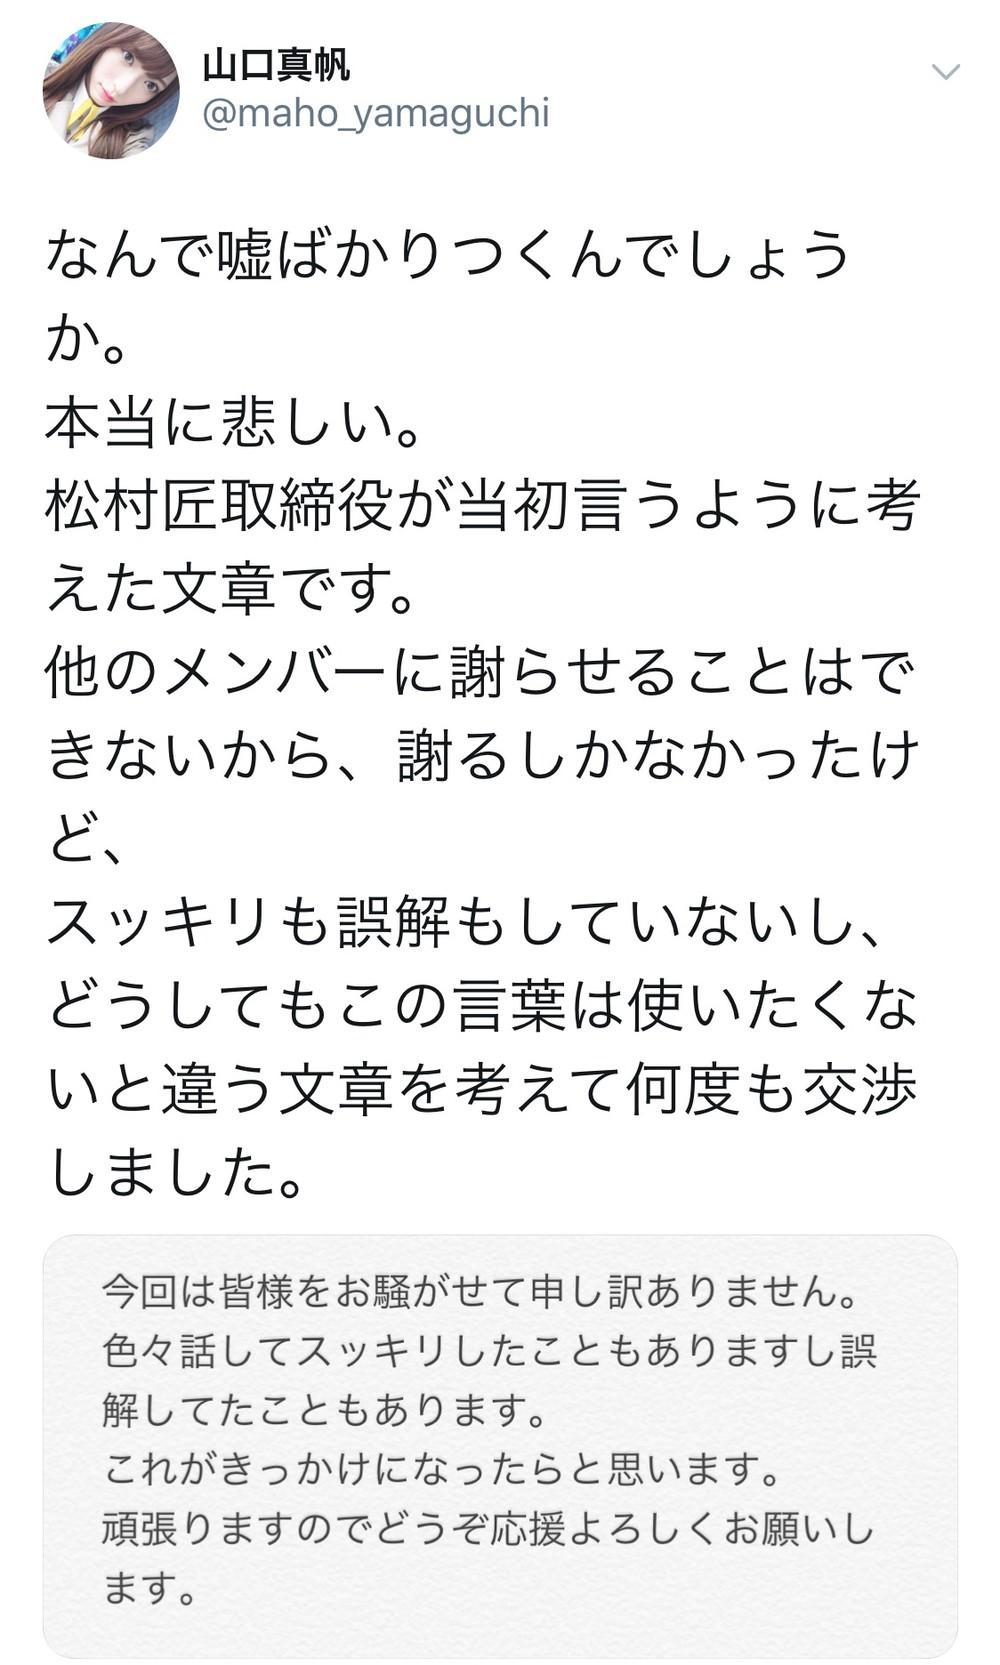 NGT山口さんと運営側は「平行線」 「謝罪要求」あった?なかった?